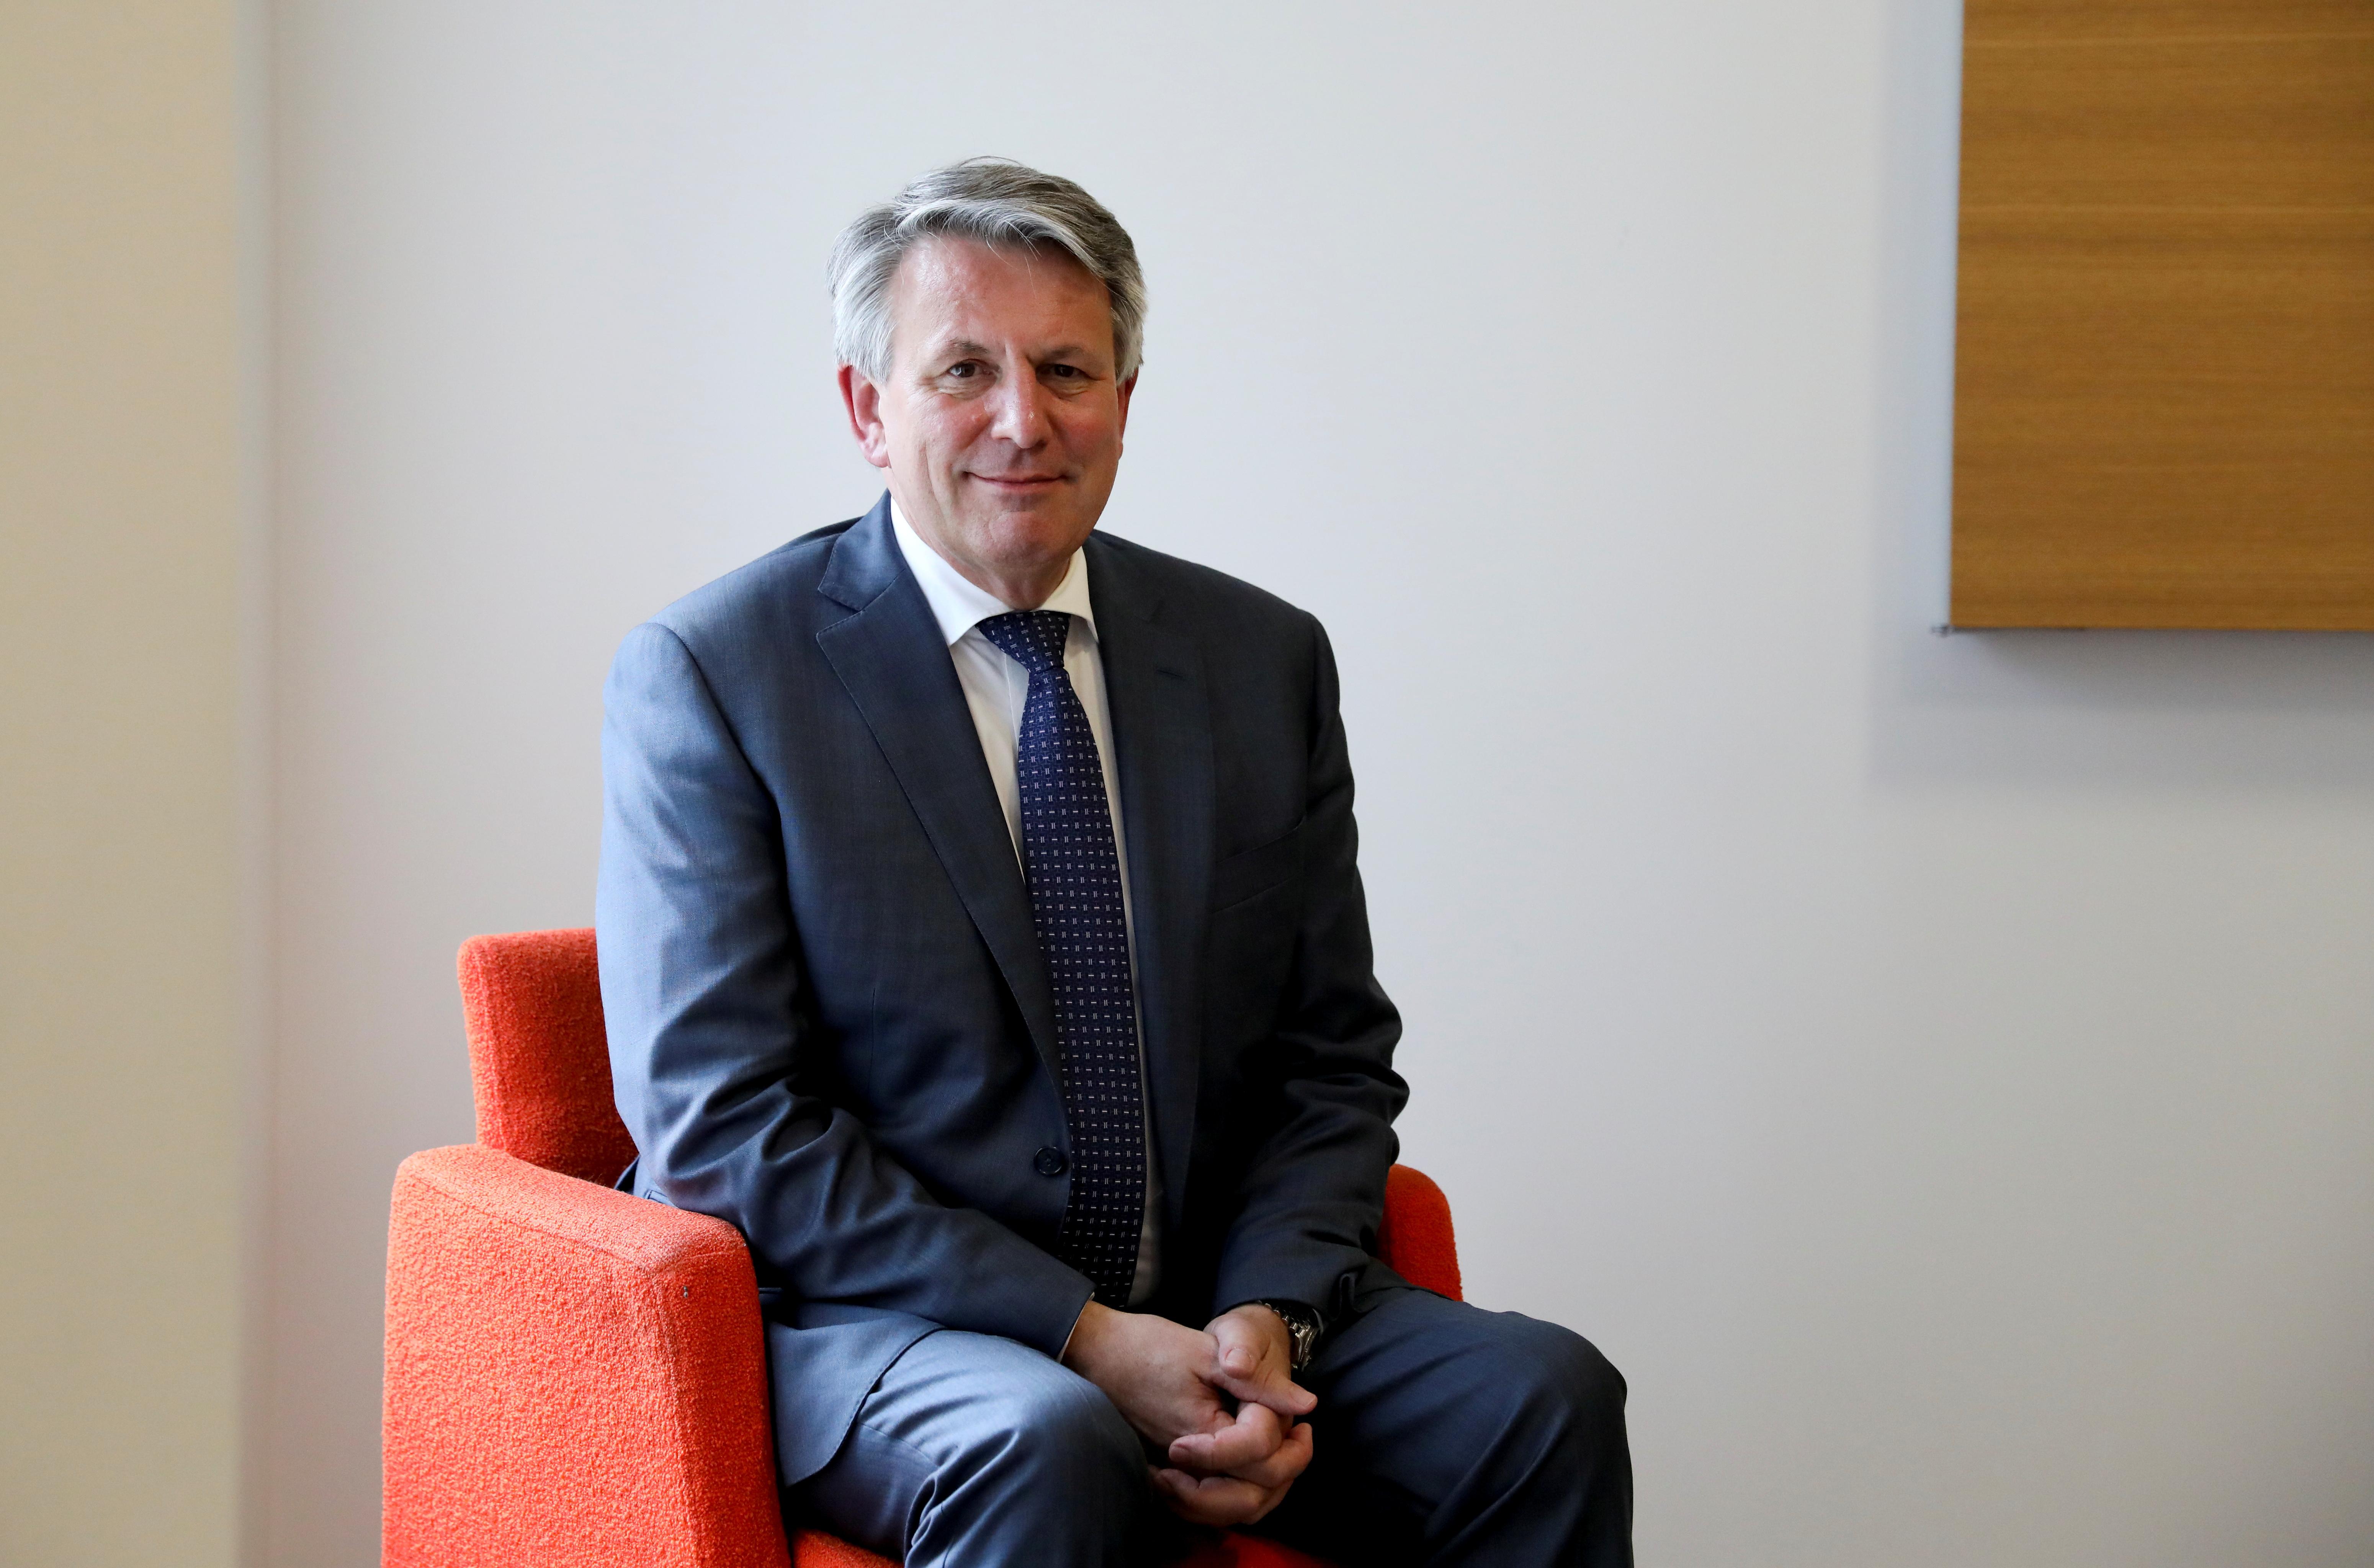 Ben Van Beurden, CEO of Shell, poses for a photograph in London, Britain, October 8, 2019. REUTERS/Marika Kochiashvili/File Photo